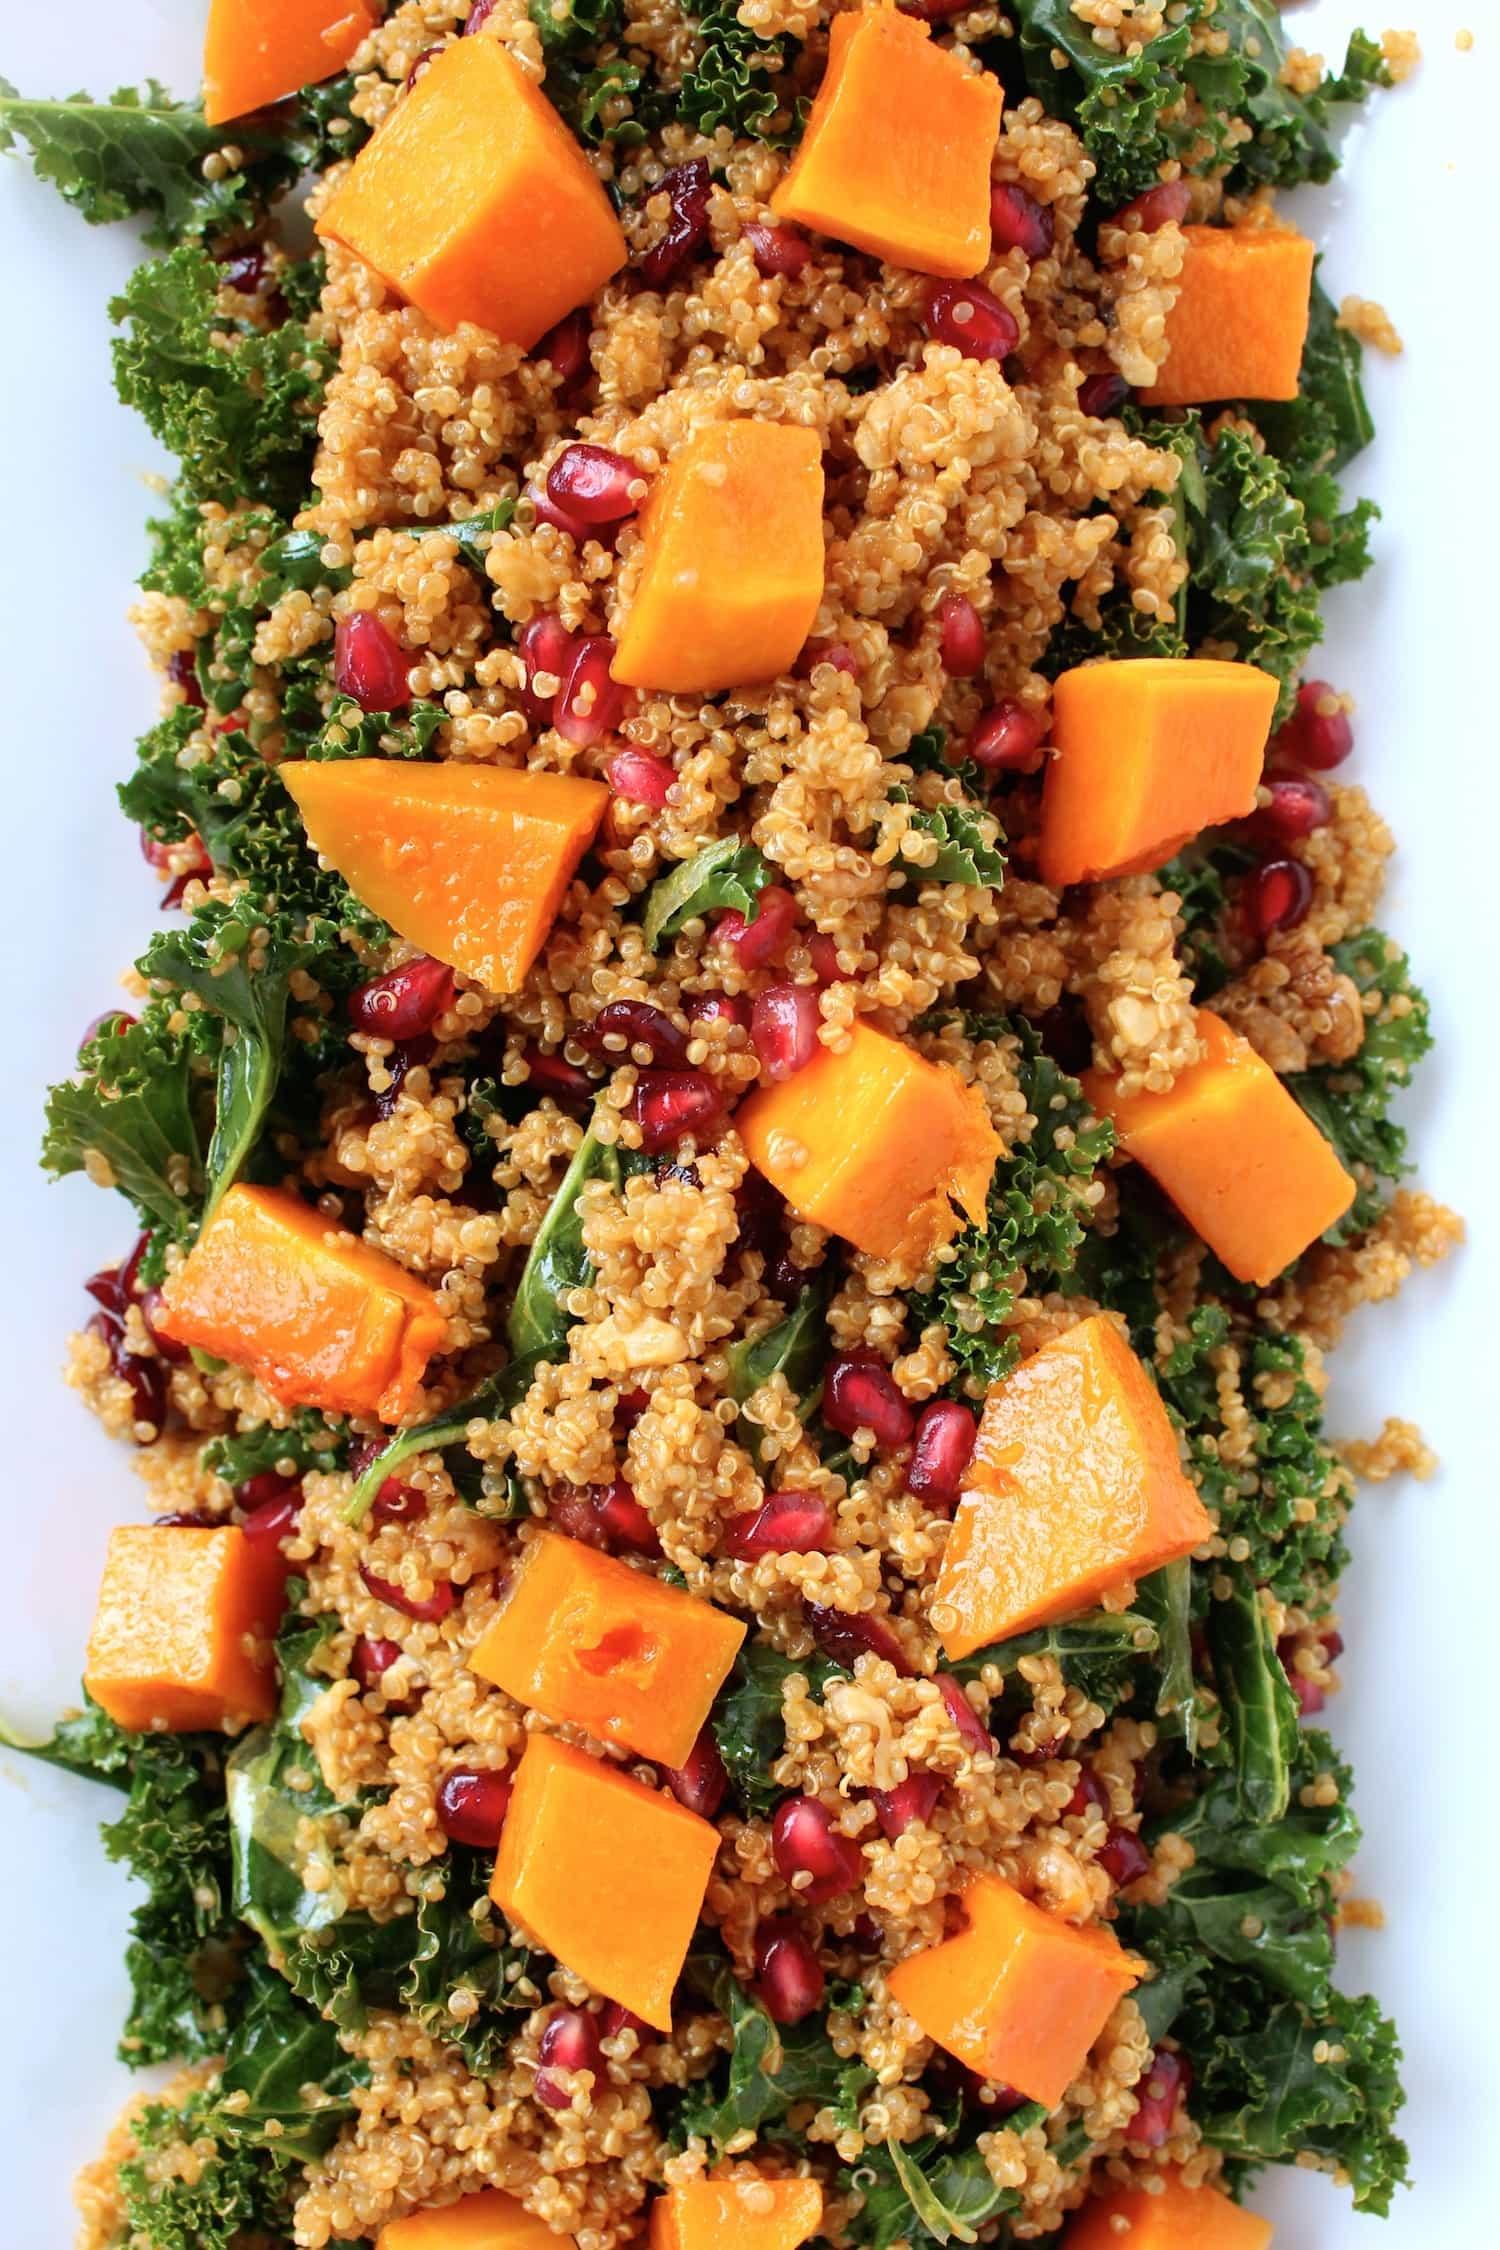 Quinoa, Kale & Roasted Butternut Squash Salad